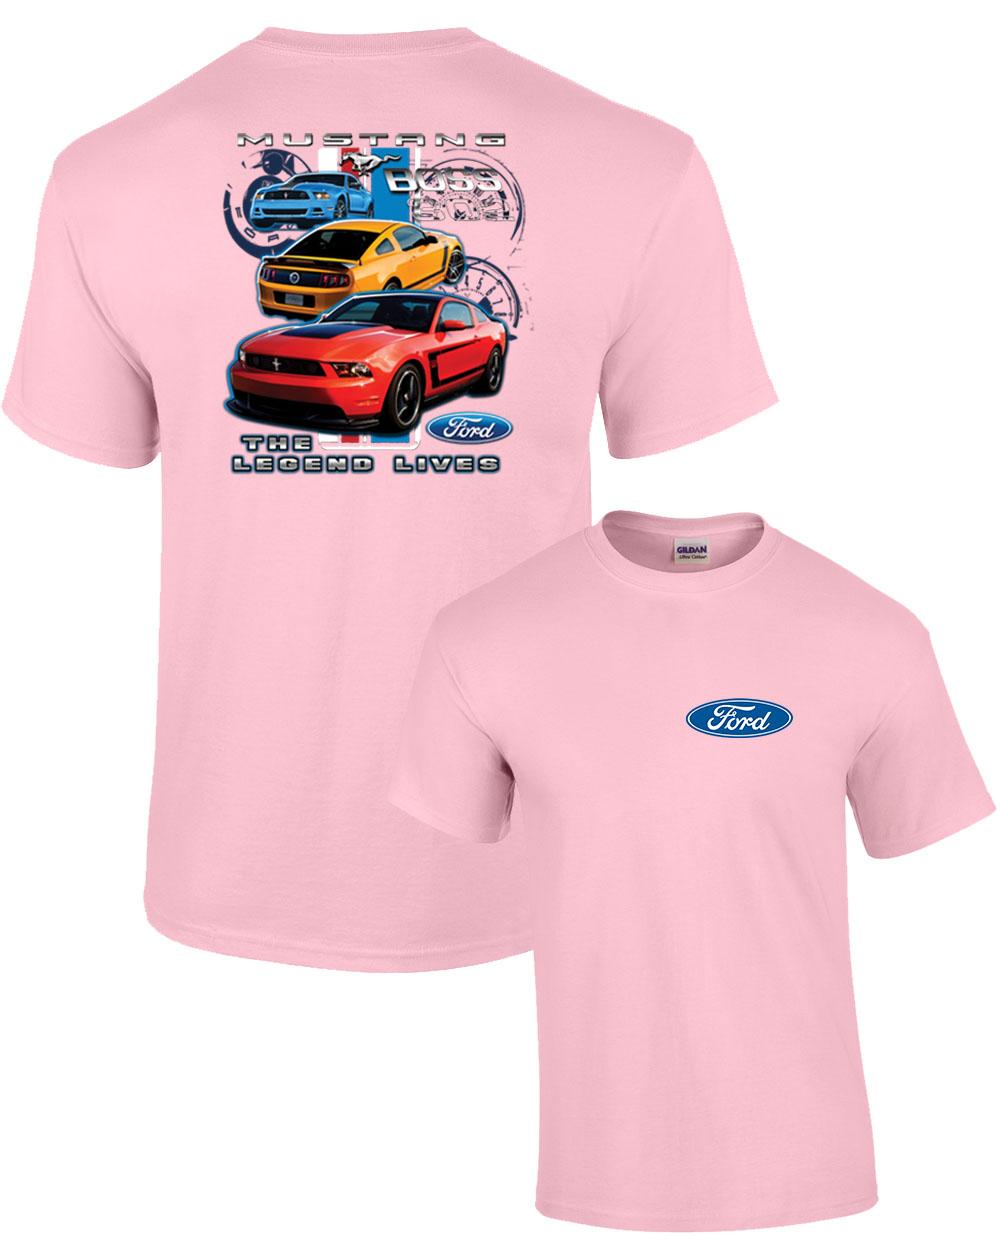 Ford Mustang Boss 302 Youth T Shirt Legend Lives Design Ebay